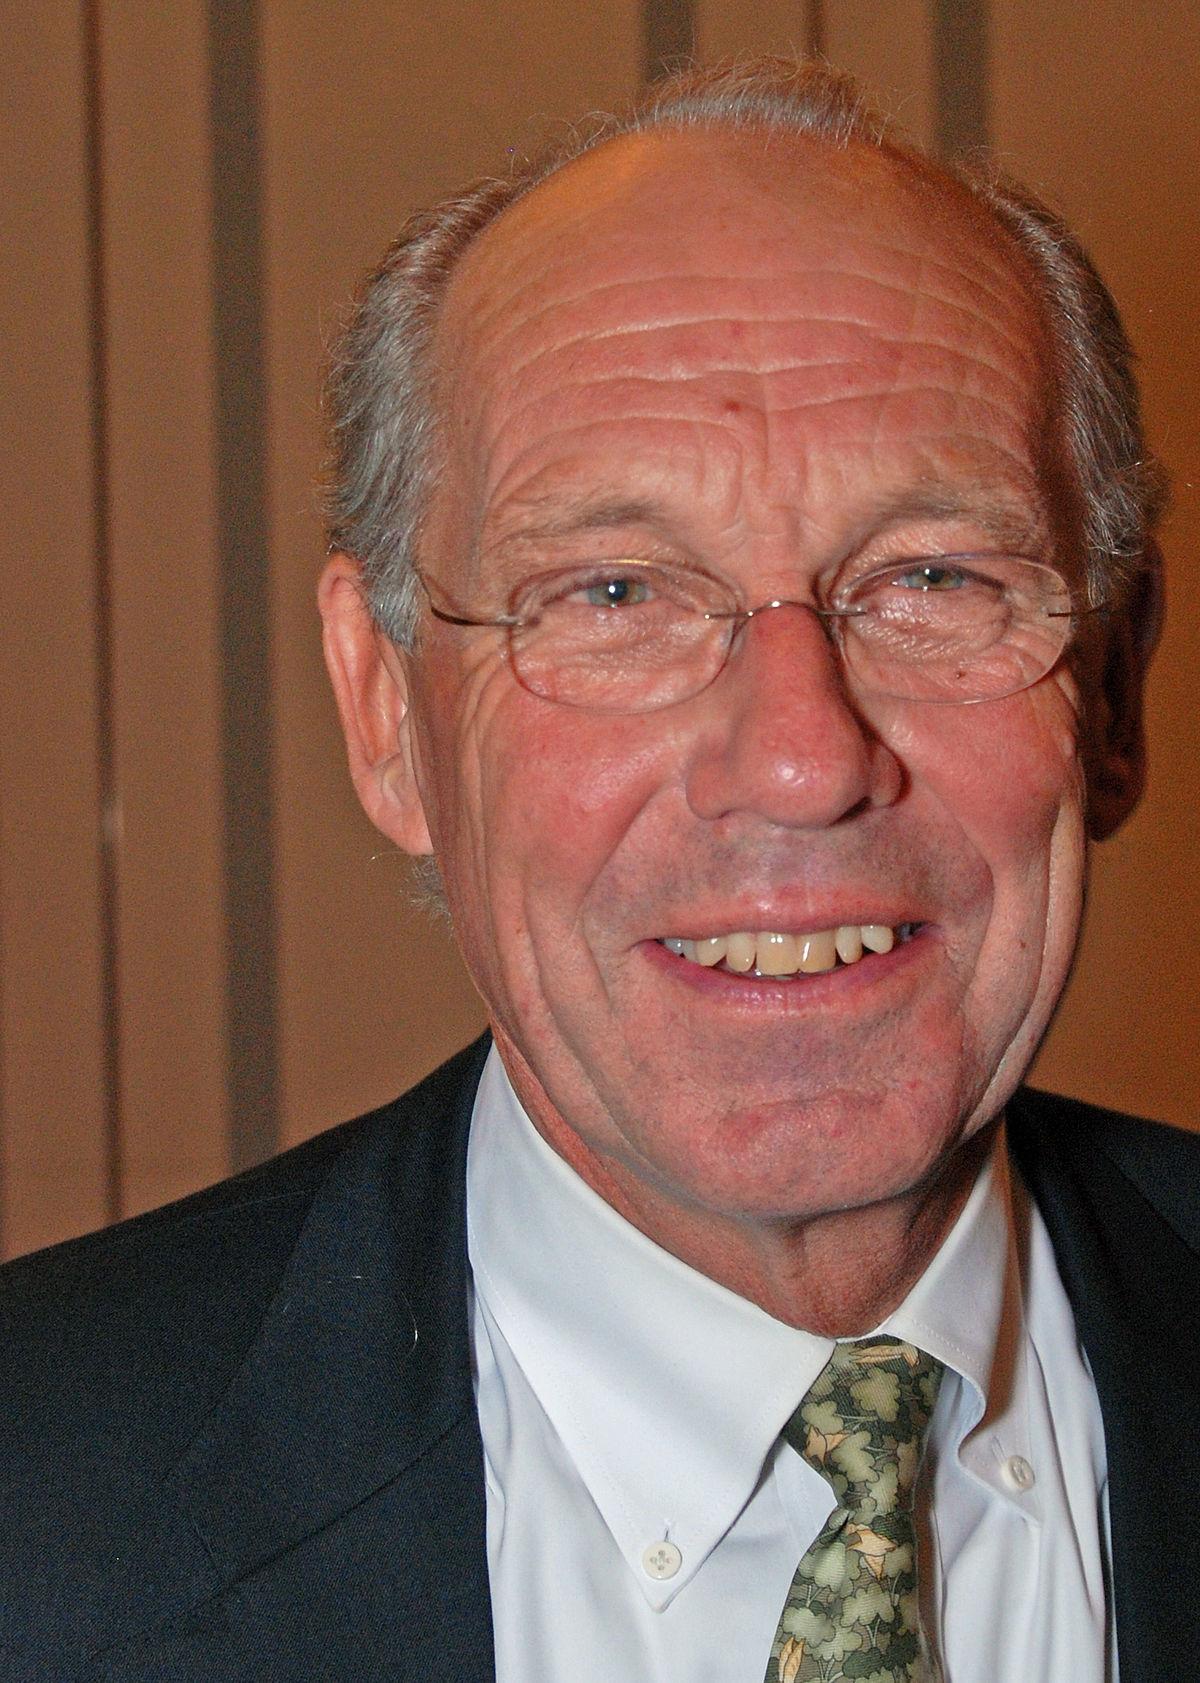 Jørgen Randers - Wikipedia